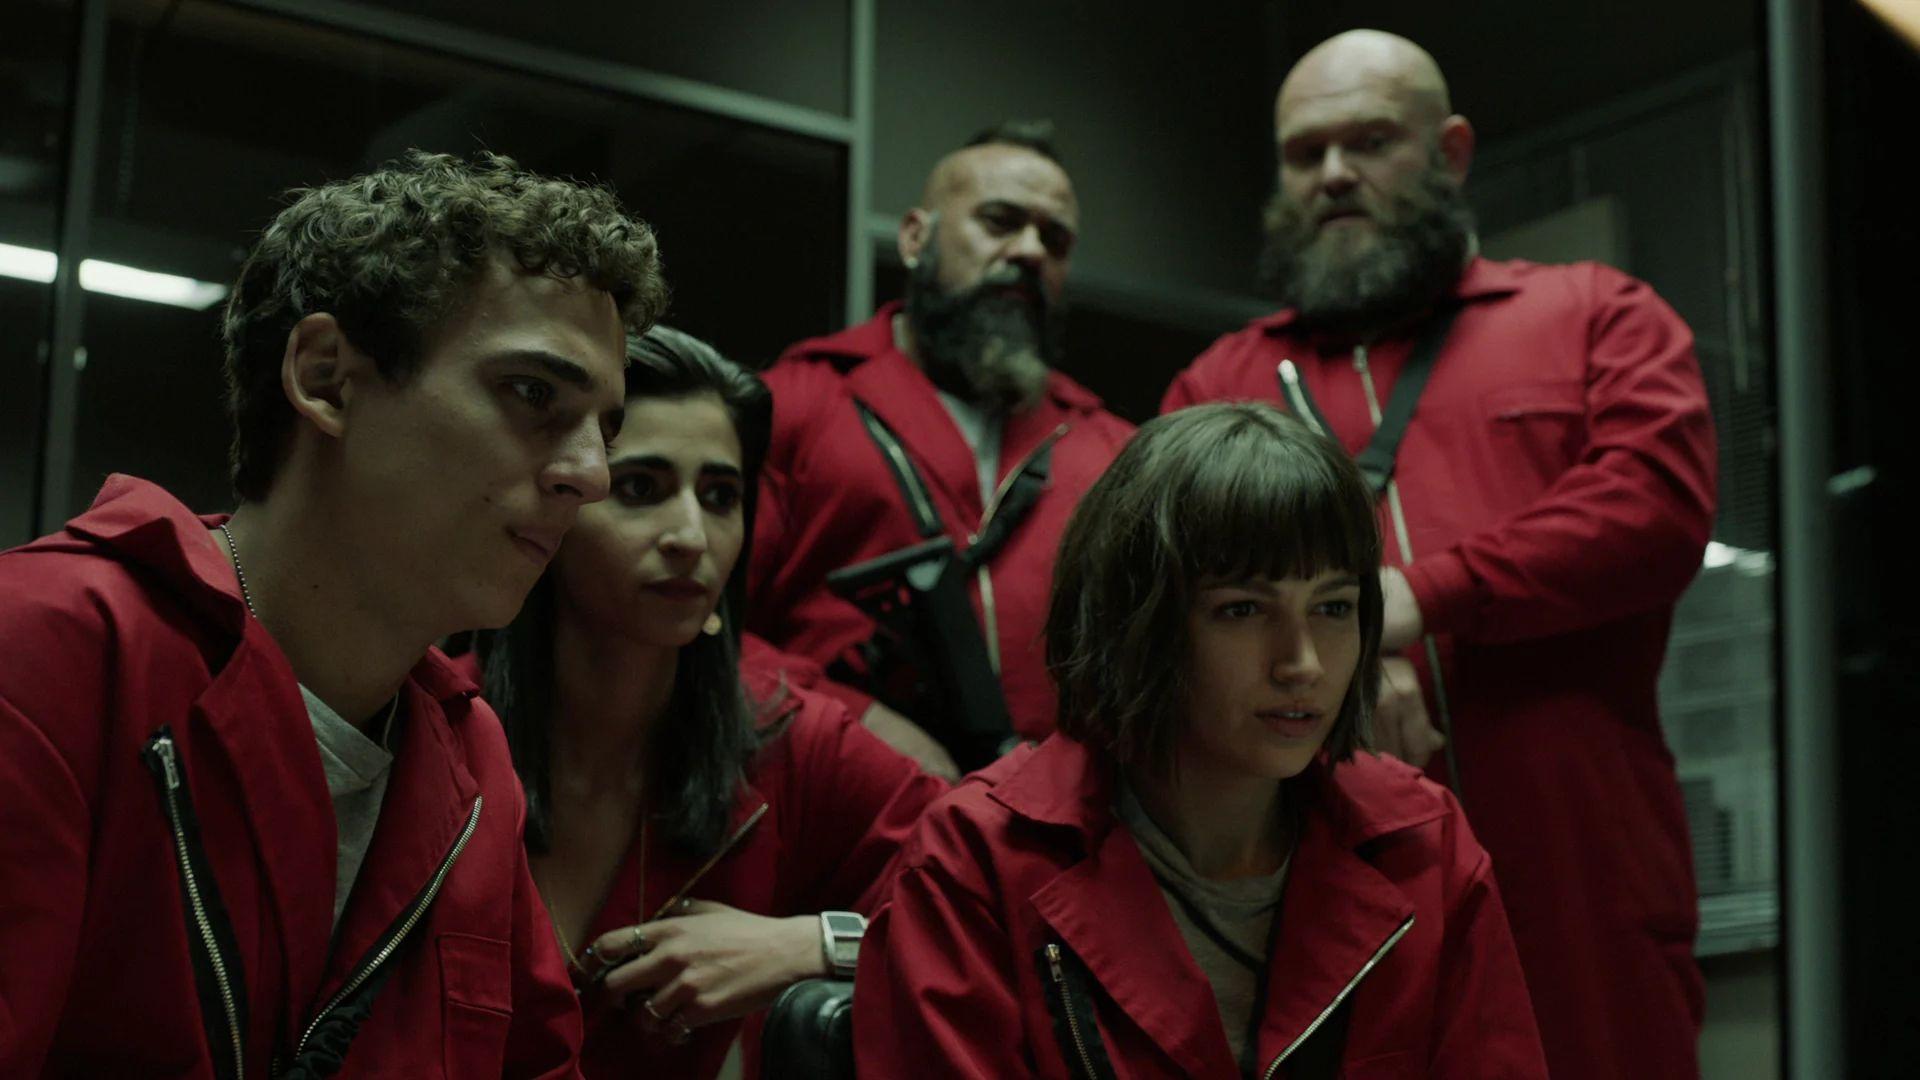 La Casa De Papel Money Heist Sezonul 1 Online Hd Netflix Watch Tv Shows Movies To Watch